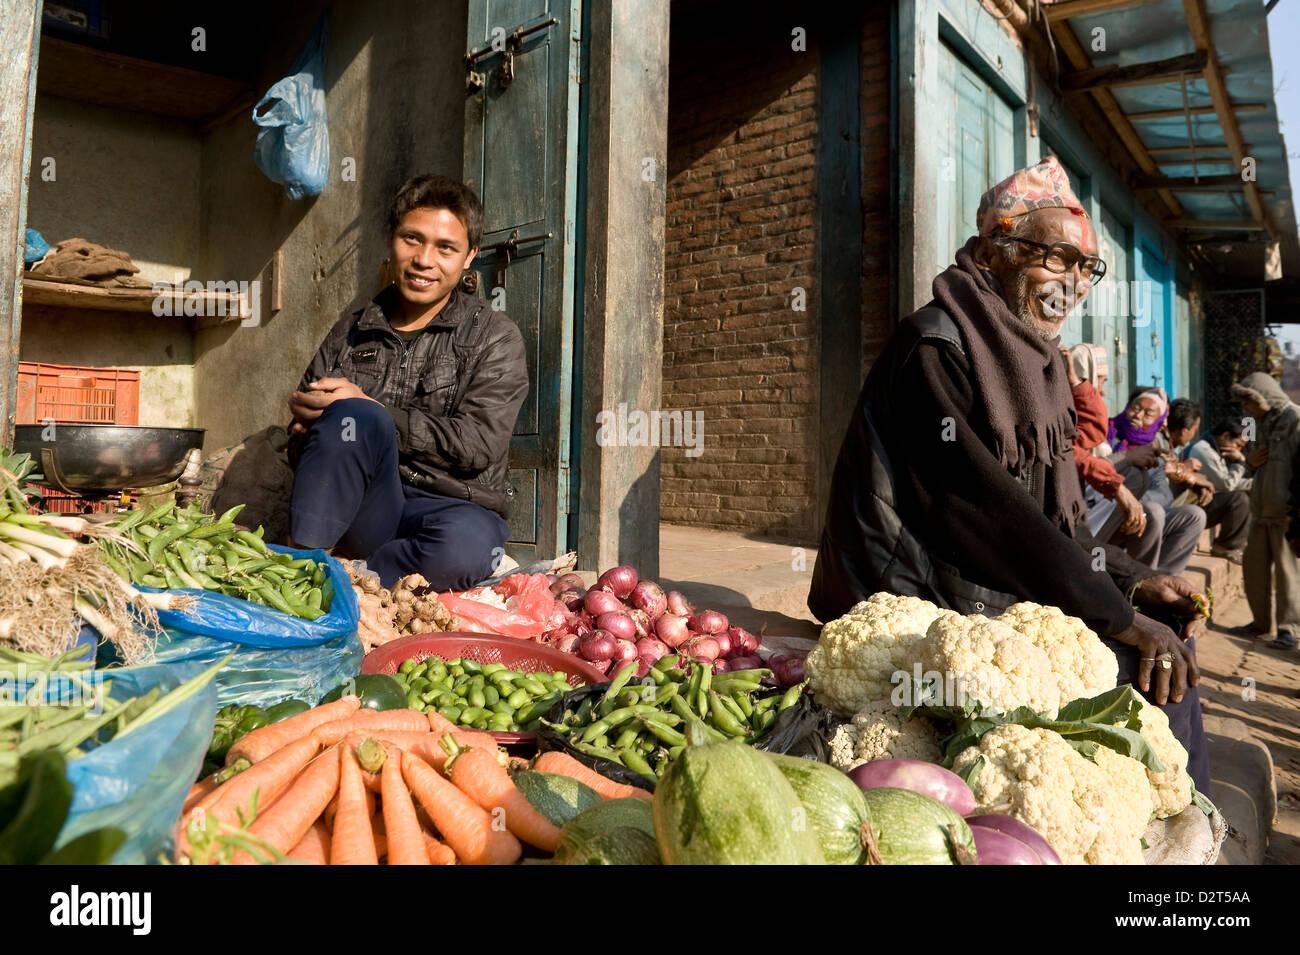 Market stall, Bhaktapur, Nepal, Asia - Stock Image